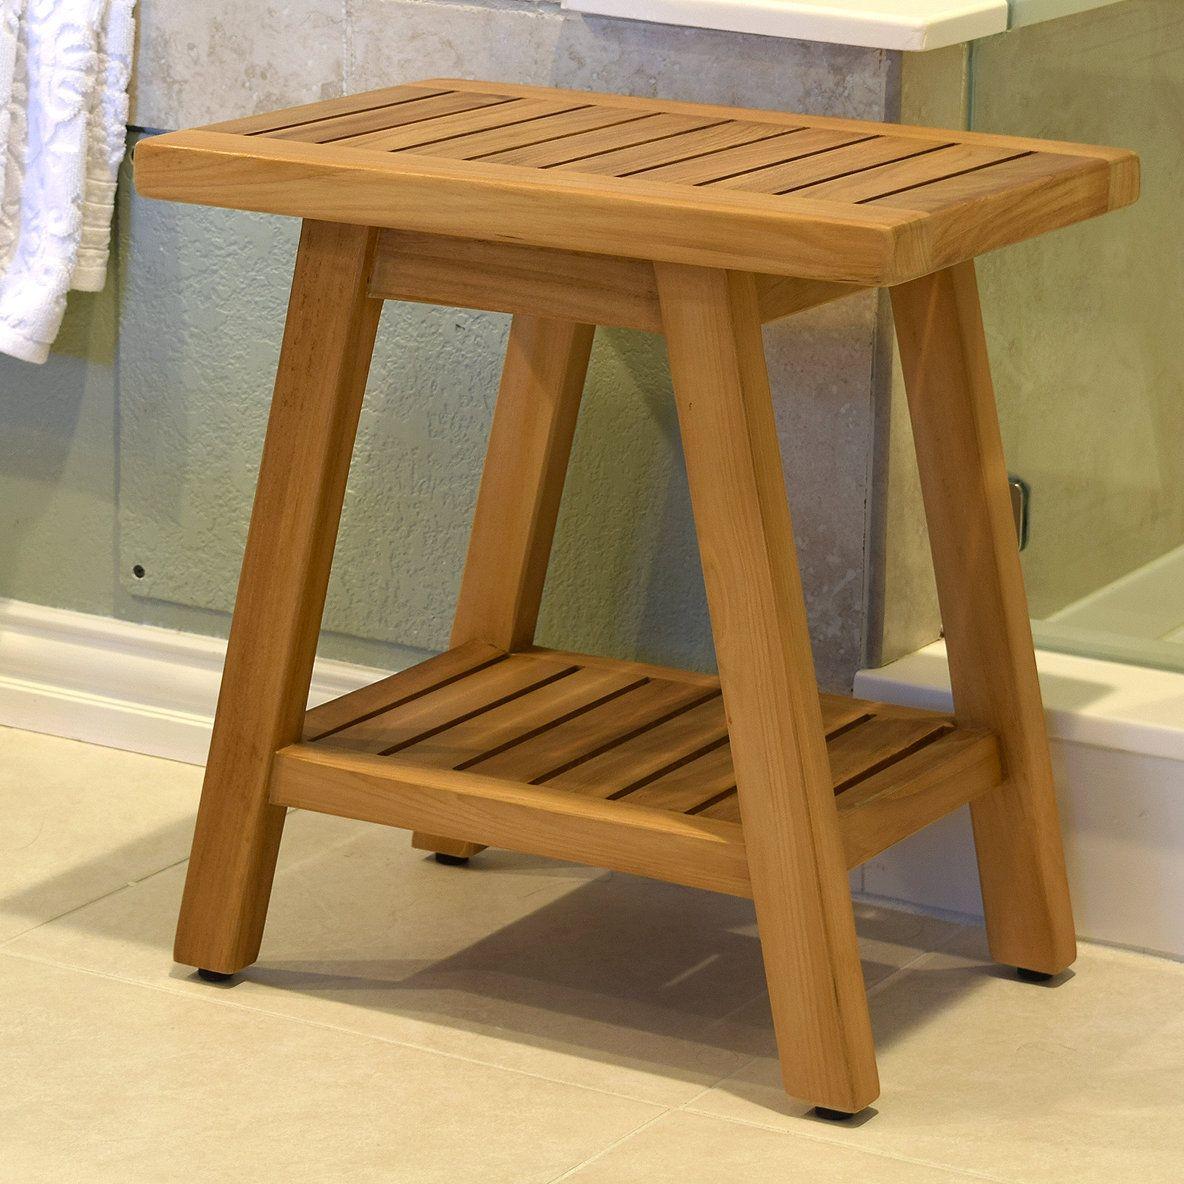 Miraculous Spa Teak Wooden Free Standing Shower Seat Wood Work Theyellowbook Wood Chair Design Ideas Theyellowbookinfo